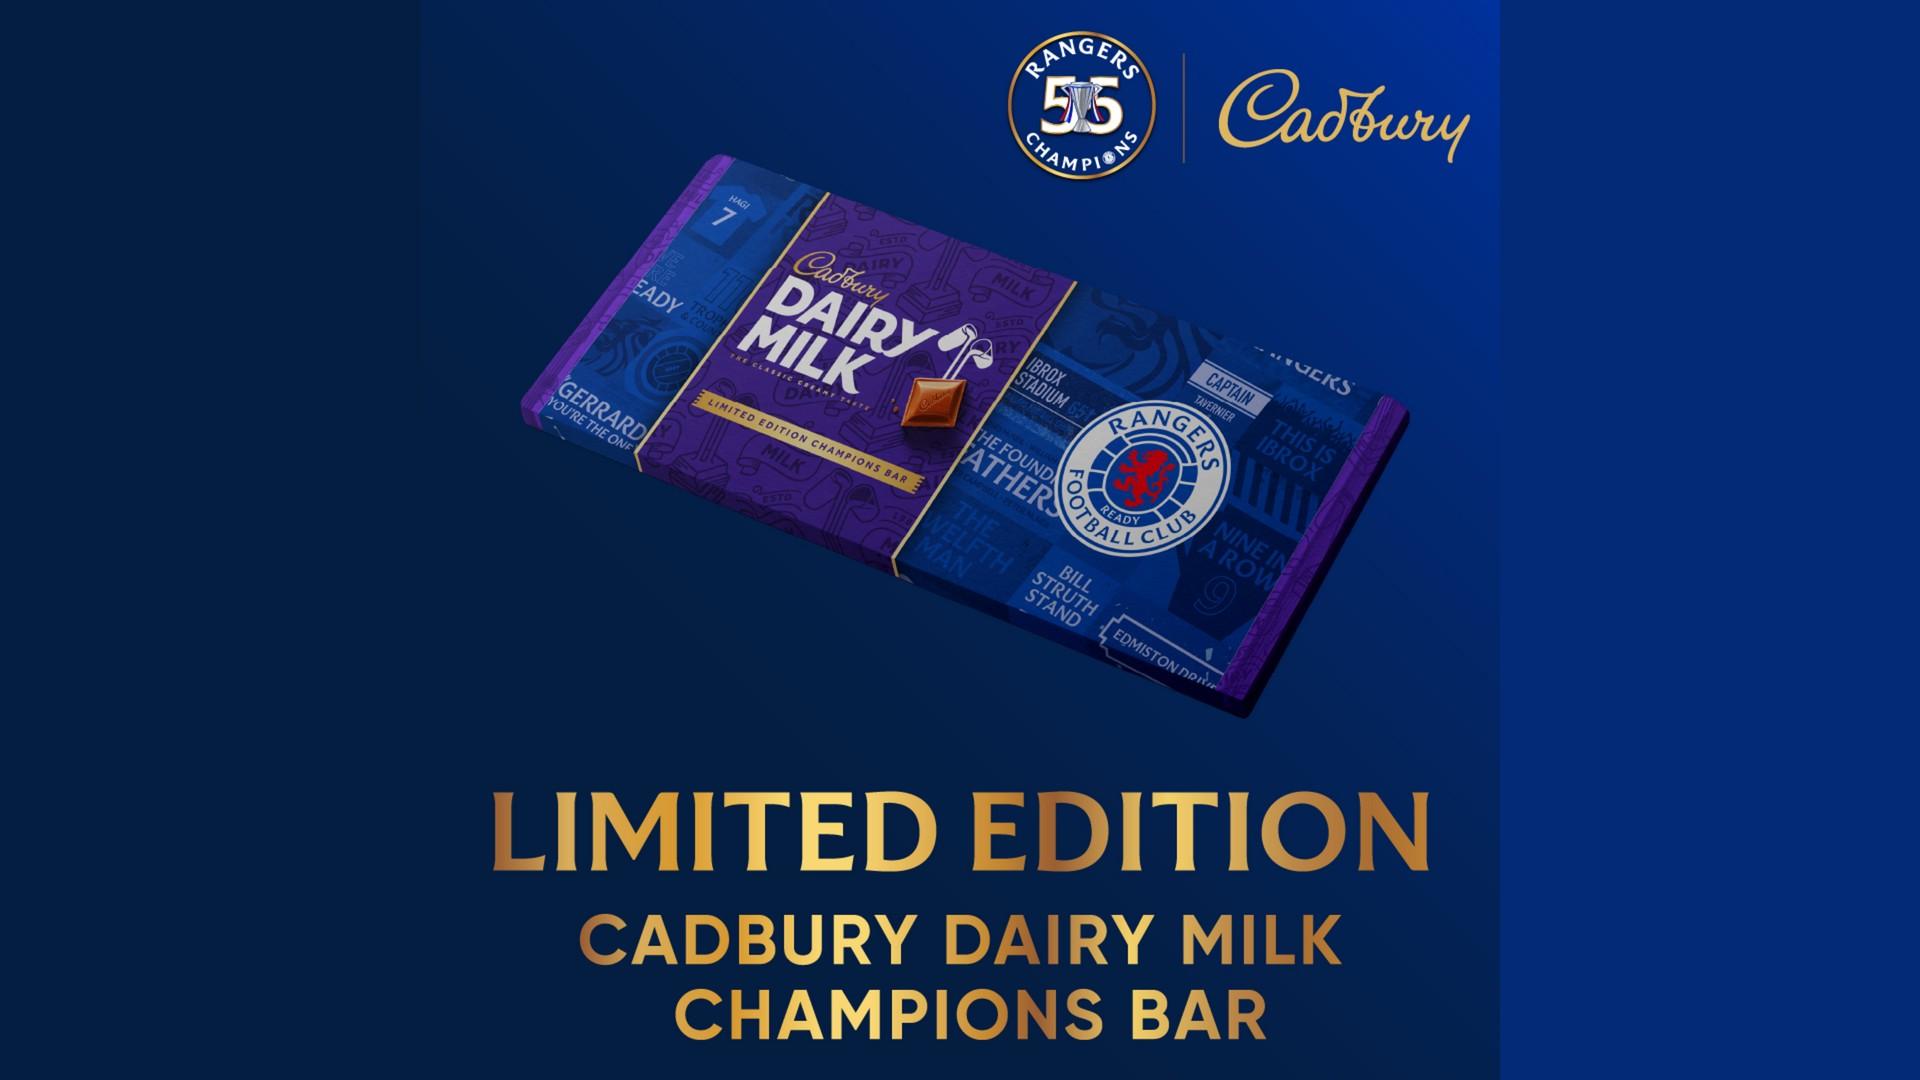 Cadbury x Glasgow Rangers (football) 2021